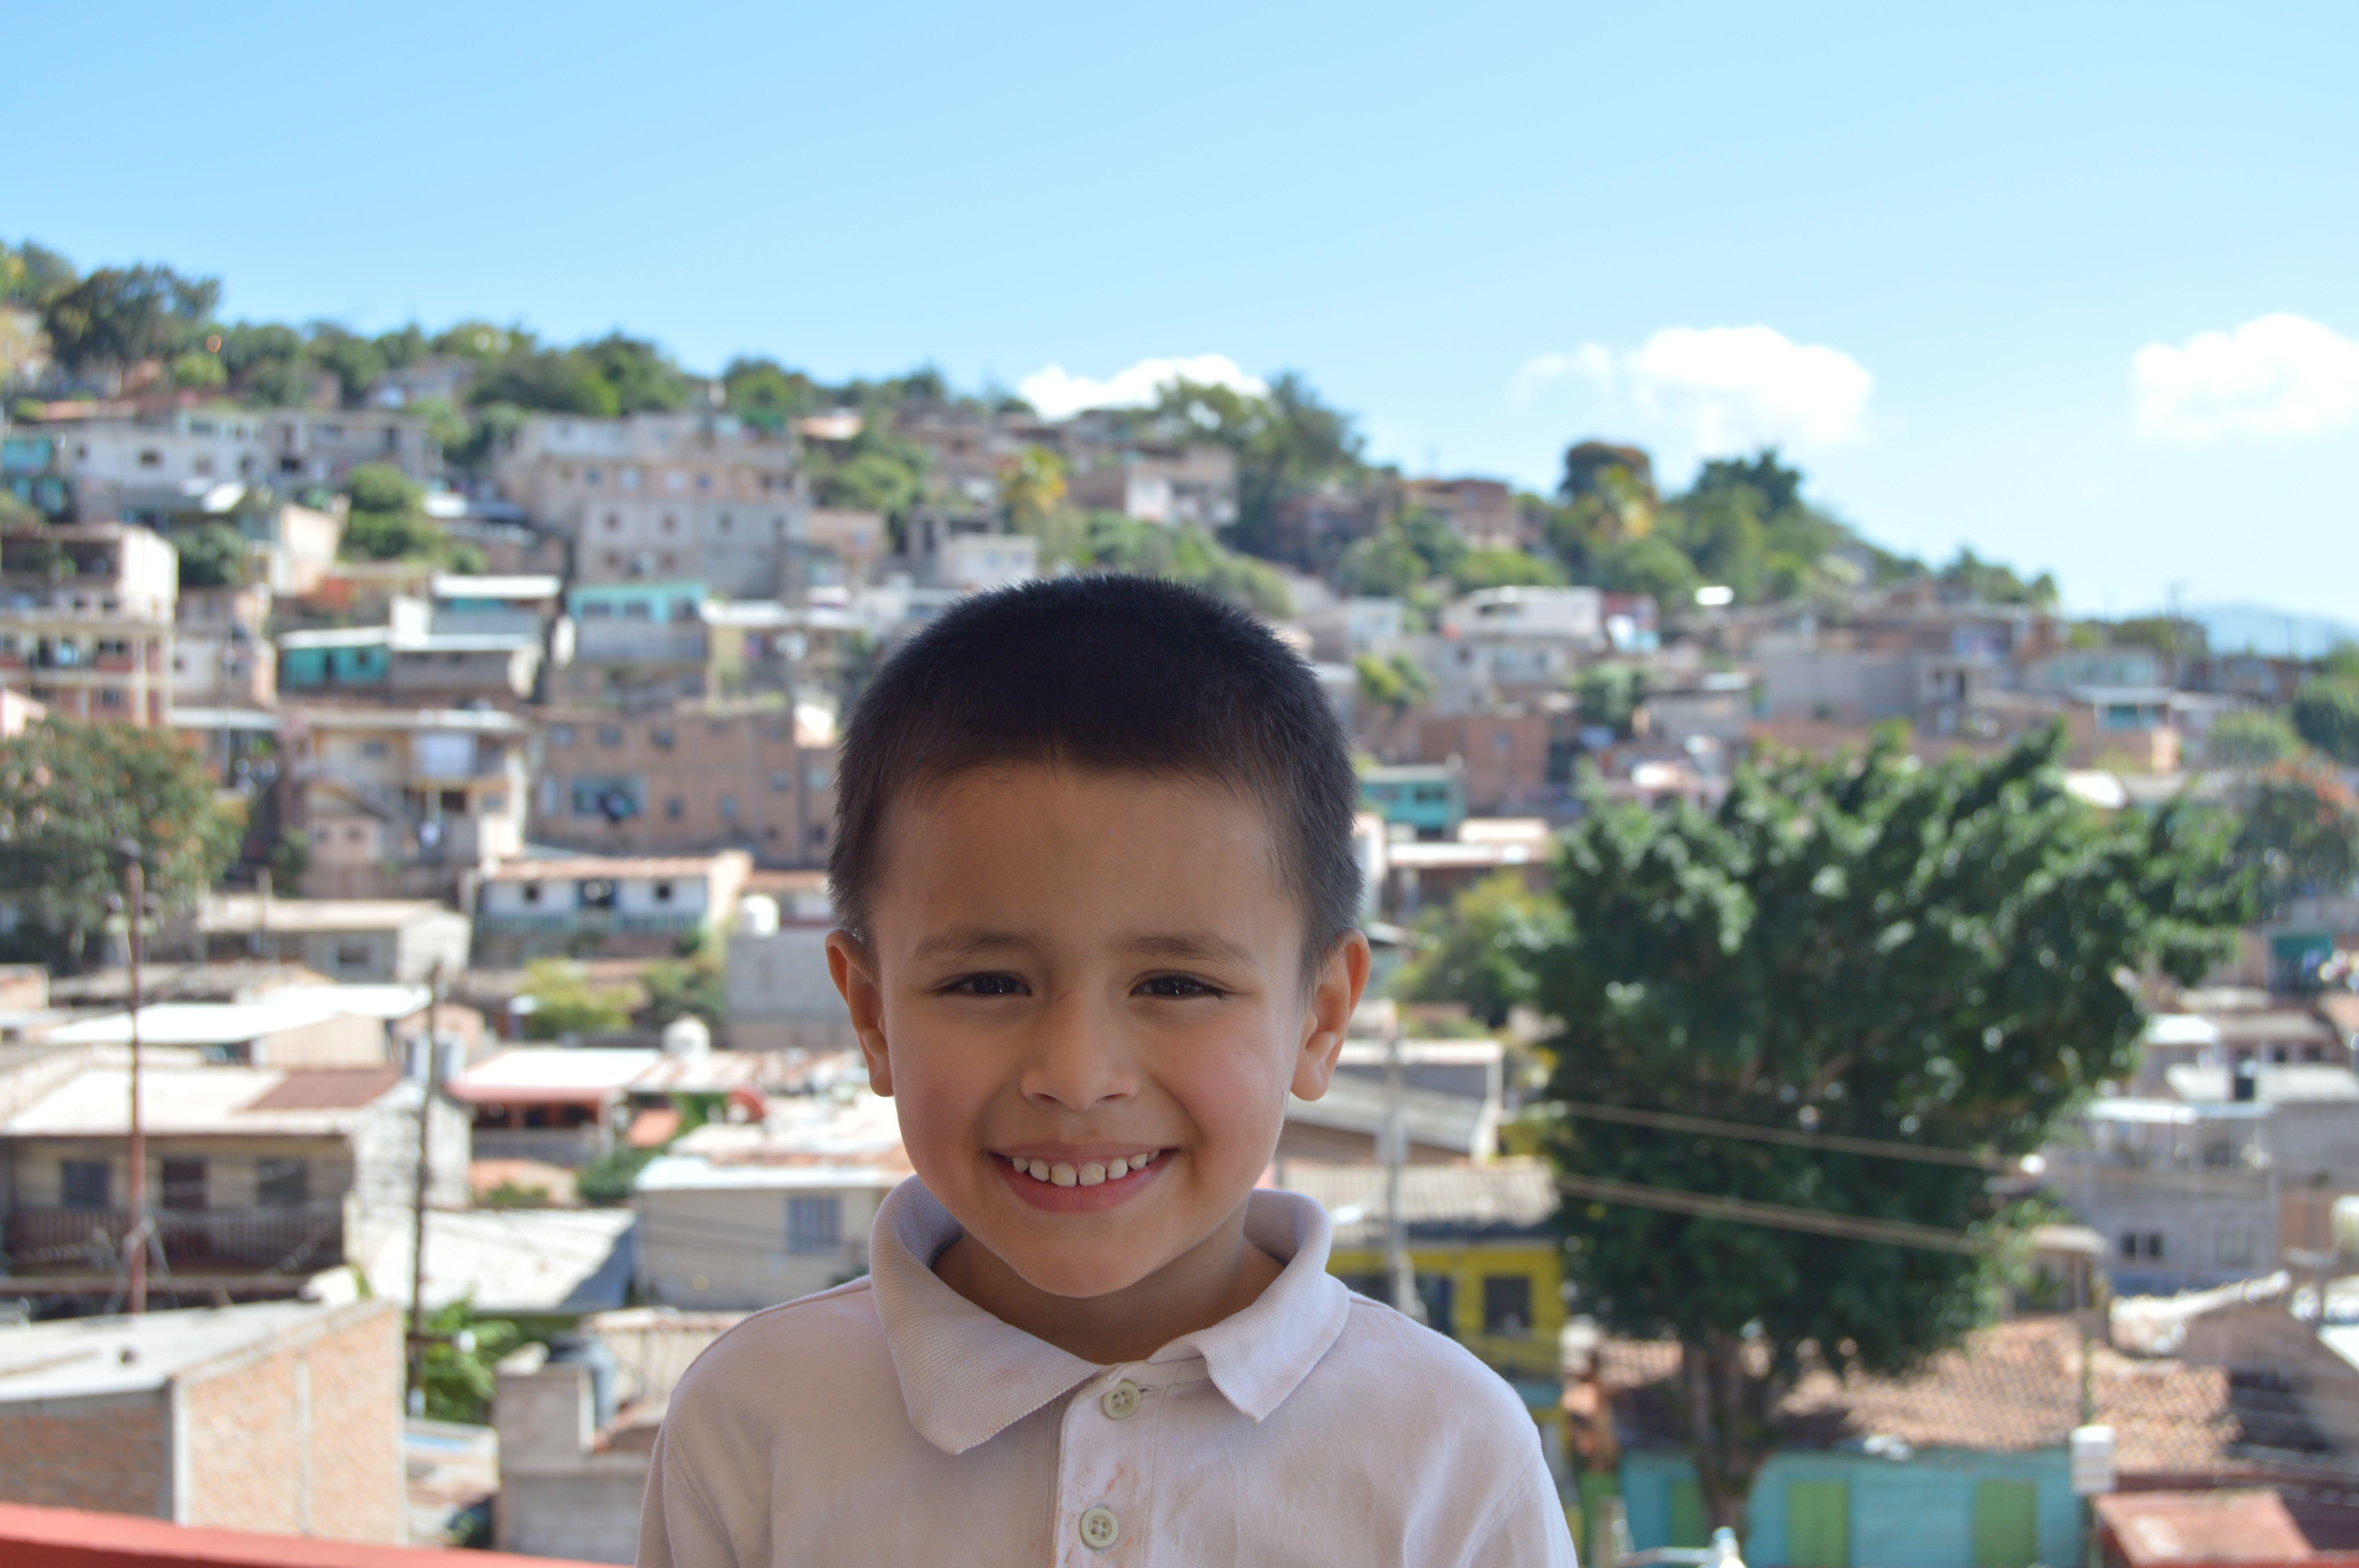 Maximo Dante Rodriguez Diaz